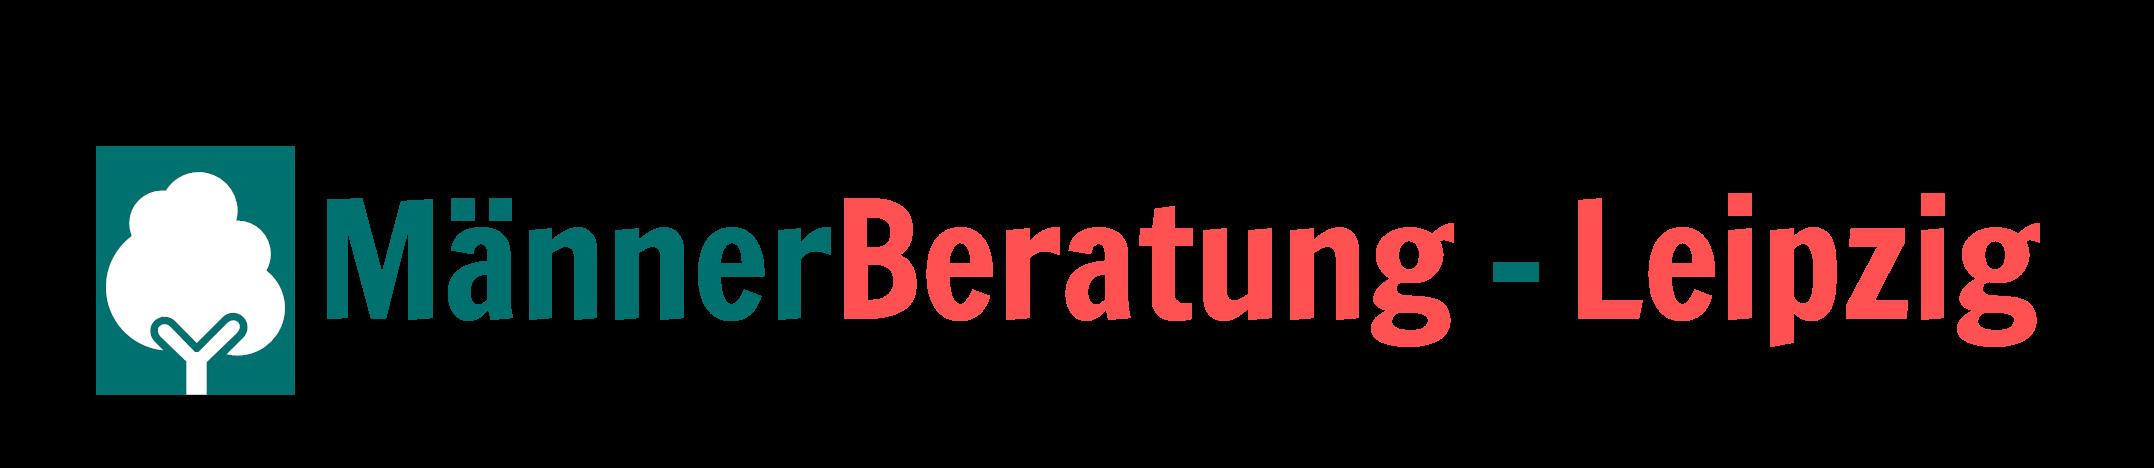 MännerBeratung-Leipzig